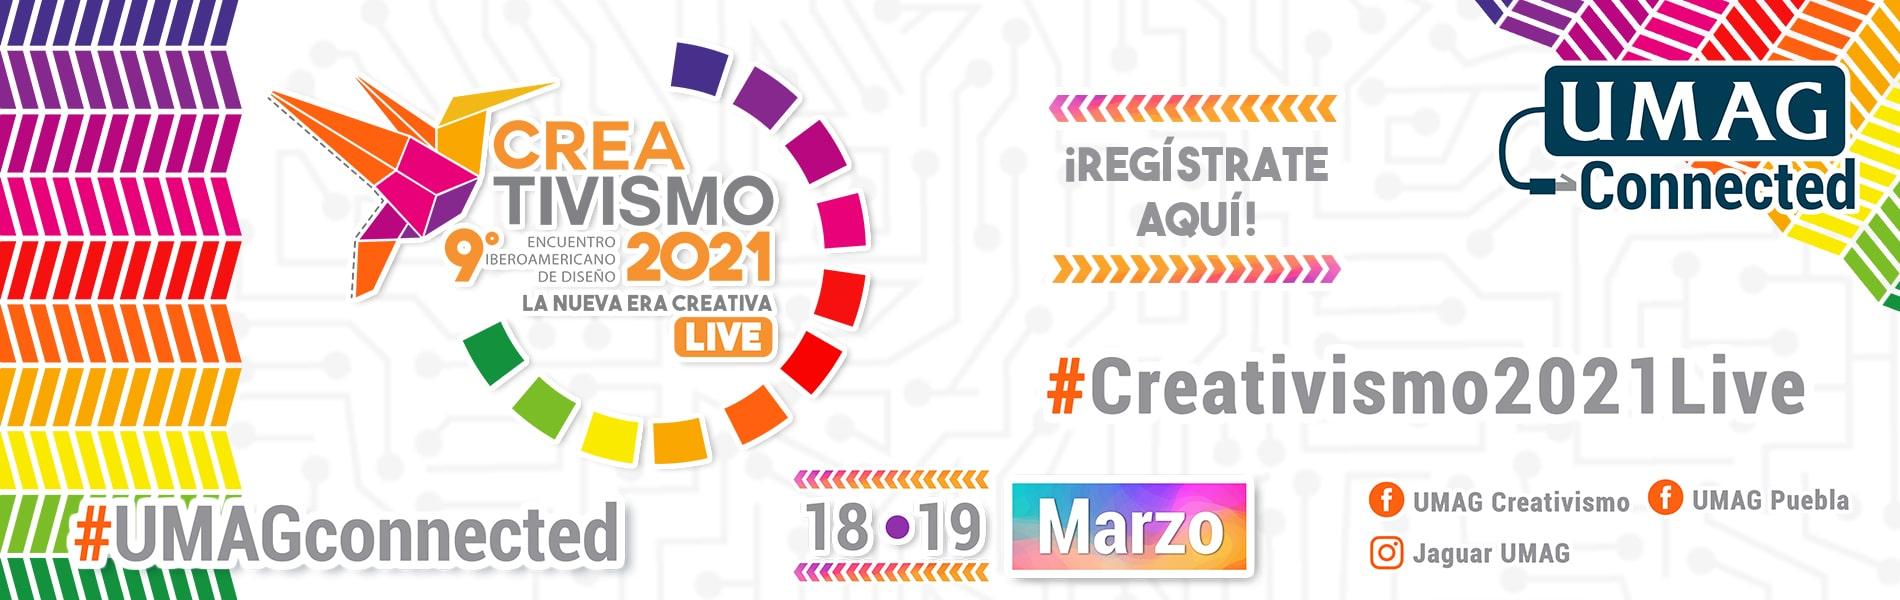 banner-creativismo21-web-min